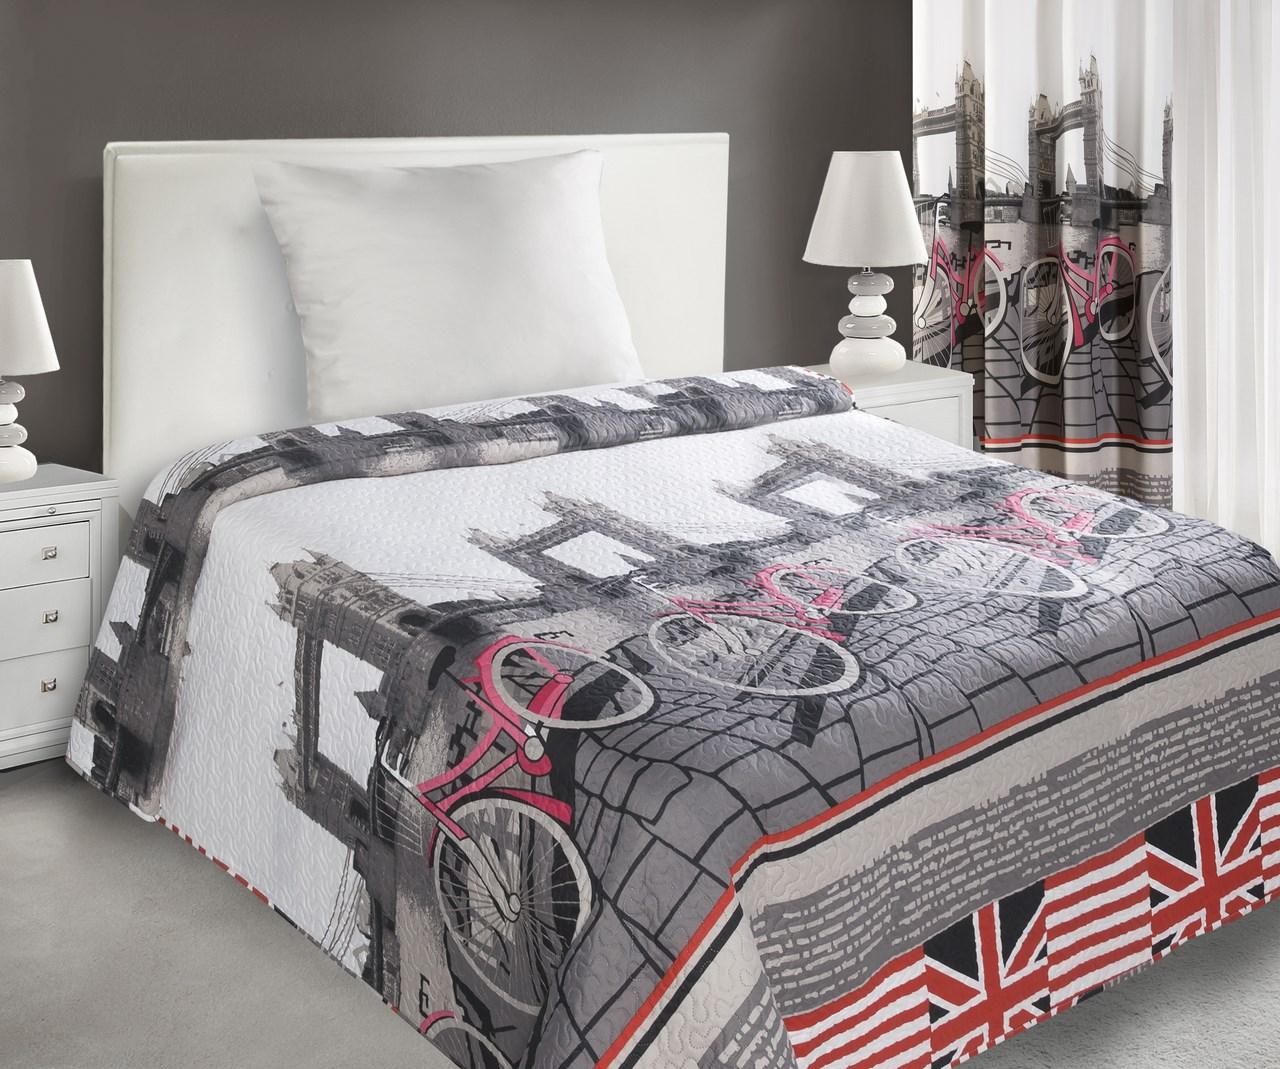 Přehoz na postel 210x170cm - Eurofirany - Usa (šedá)